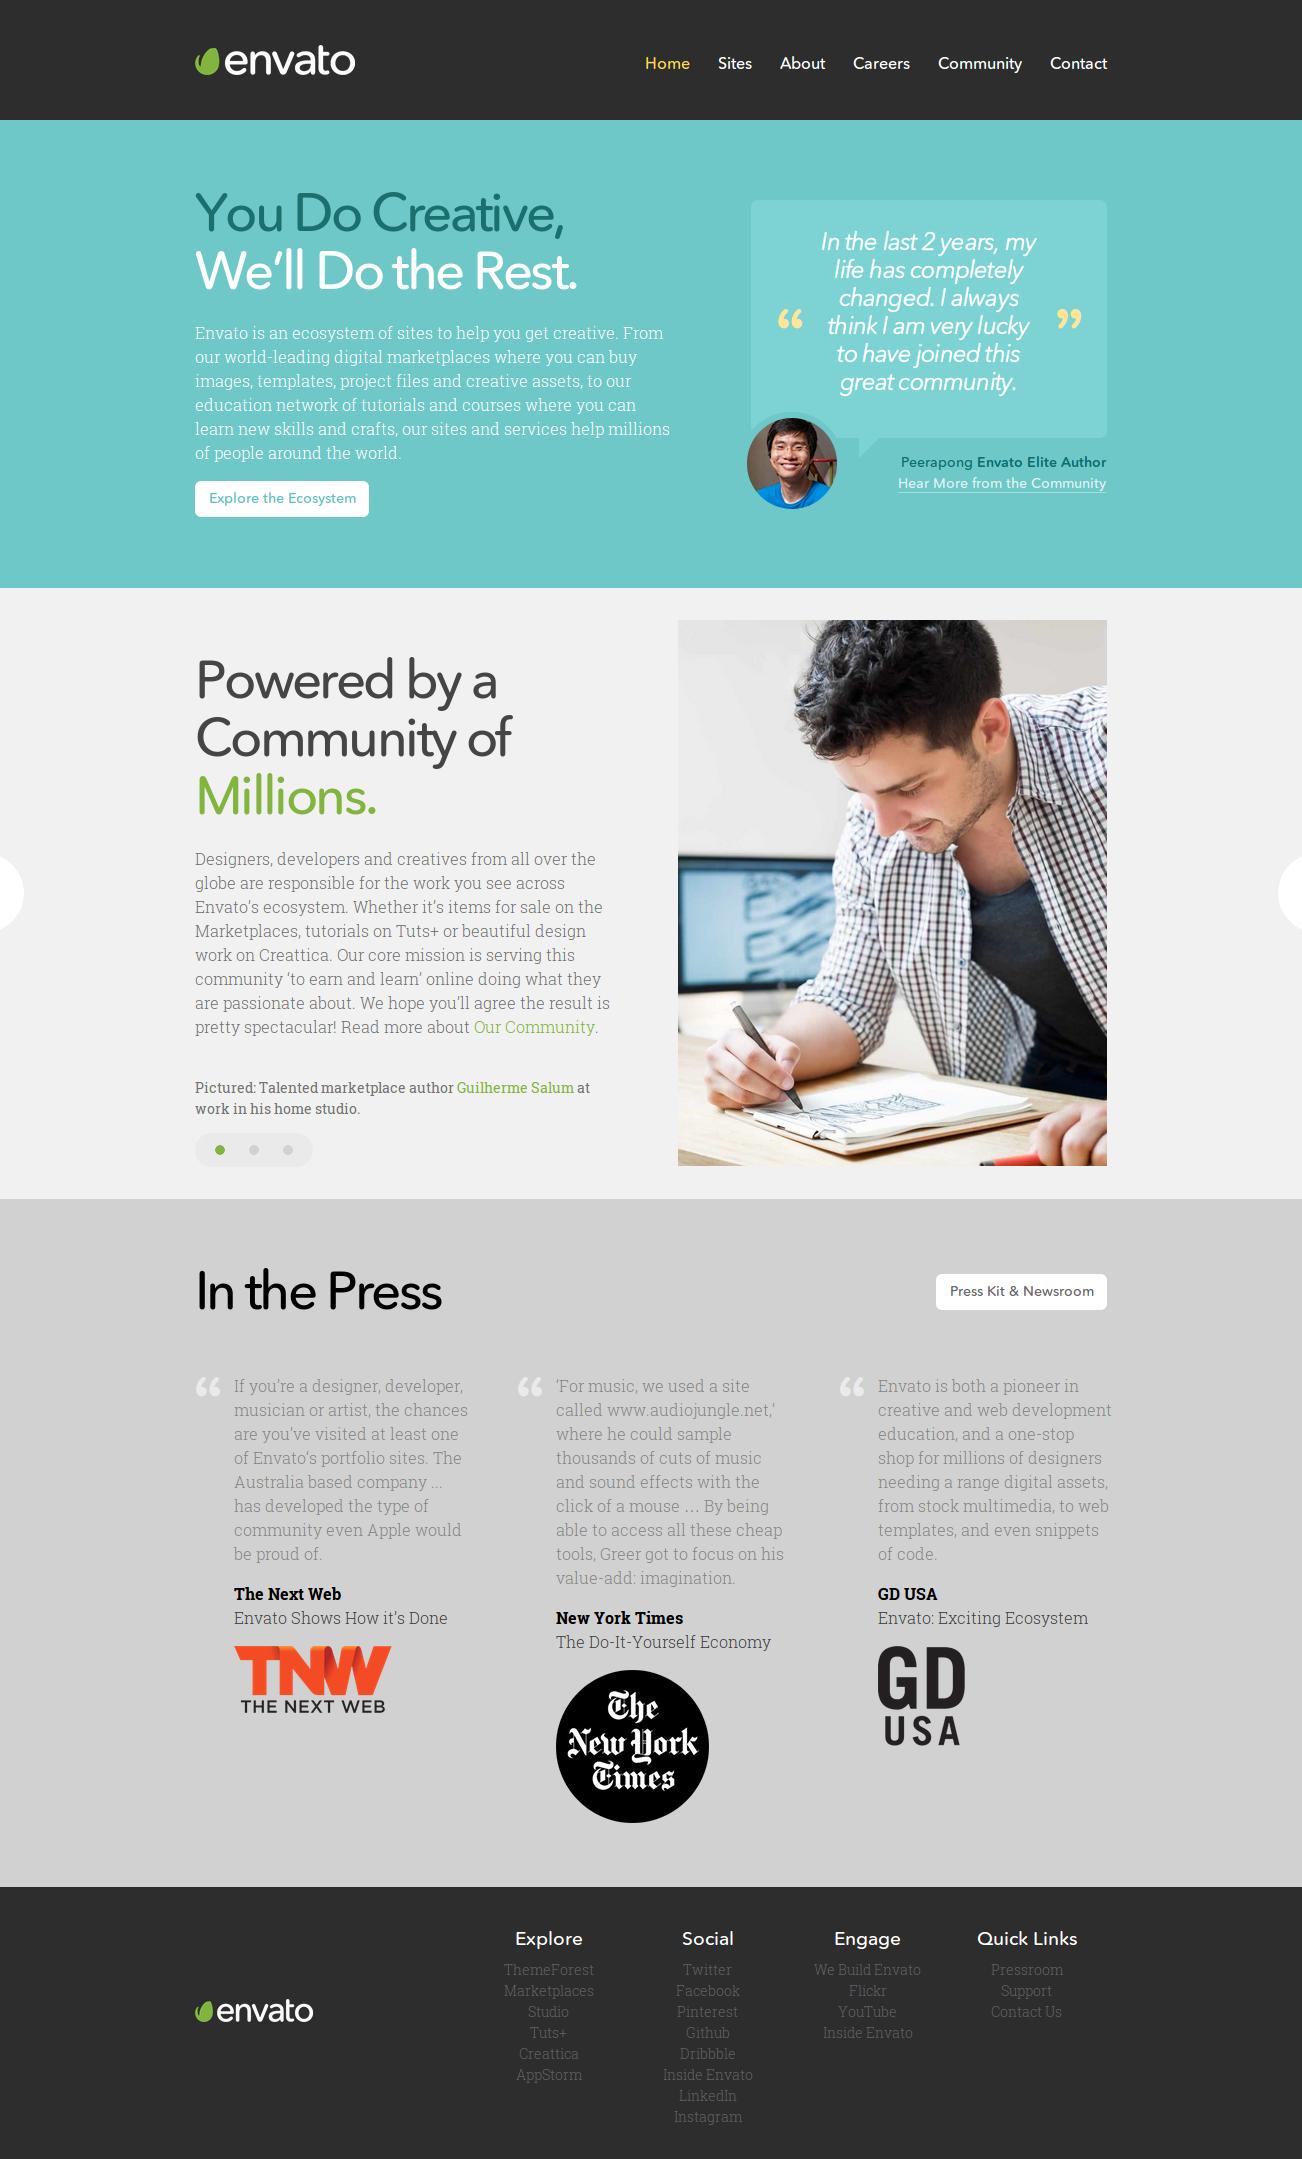 Envato Awesome Screenshot Envato Well Designed Websites Website Design Wordpress